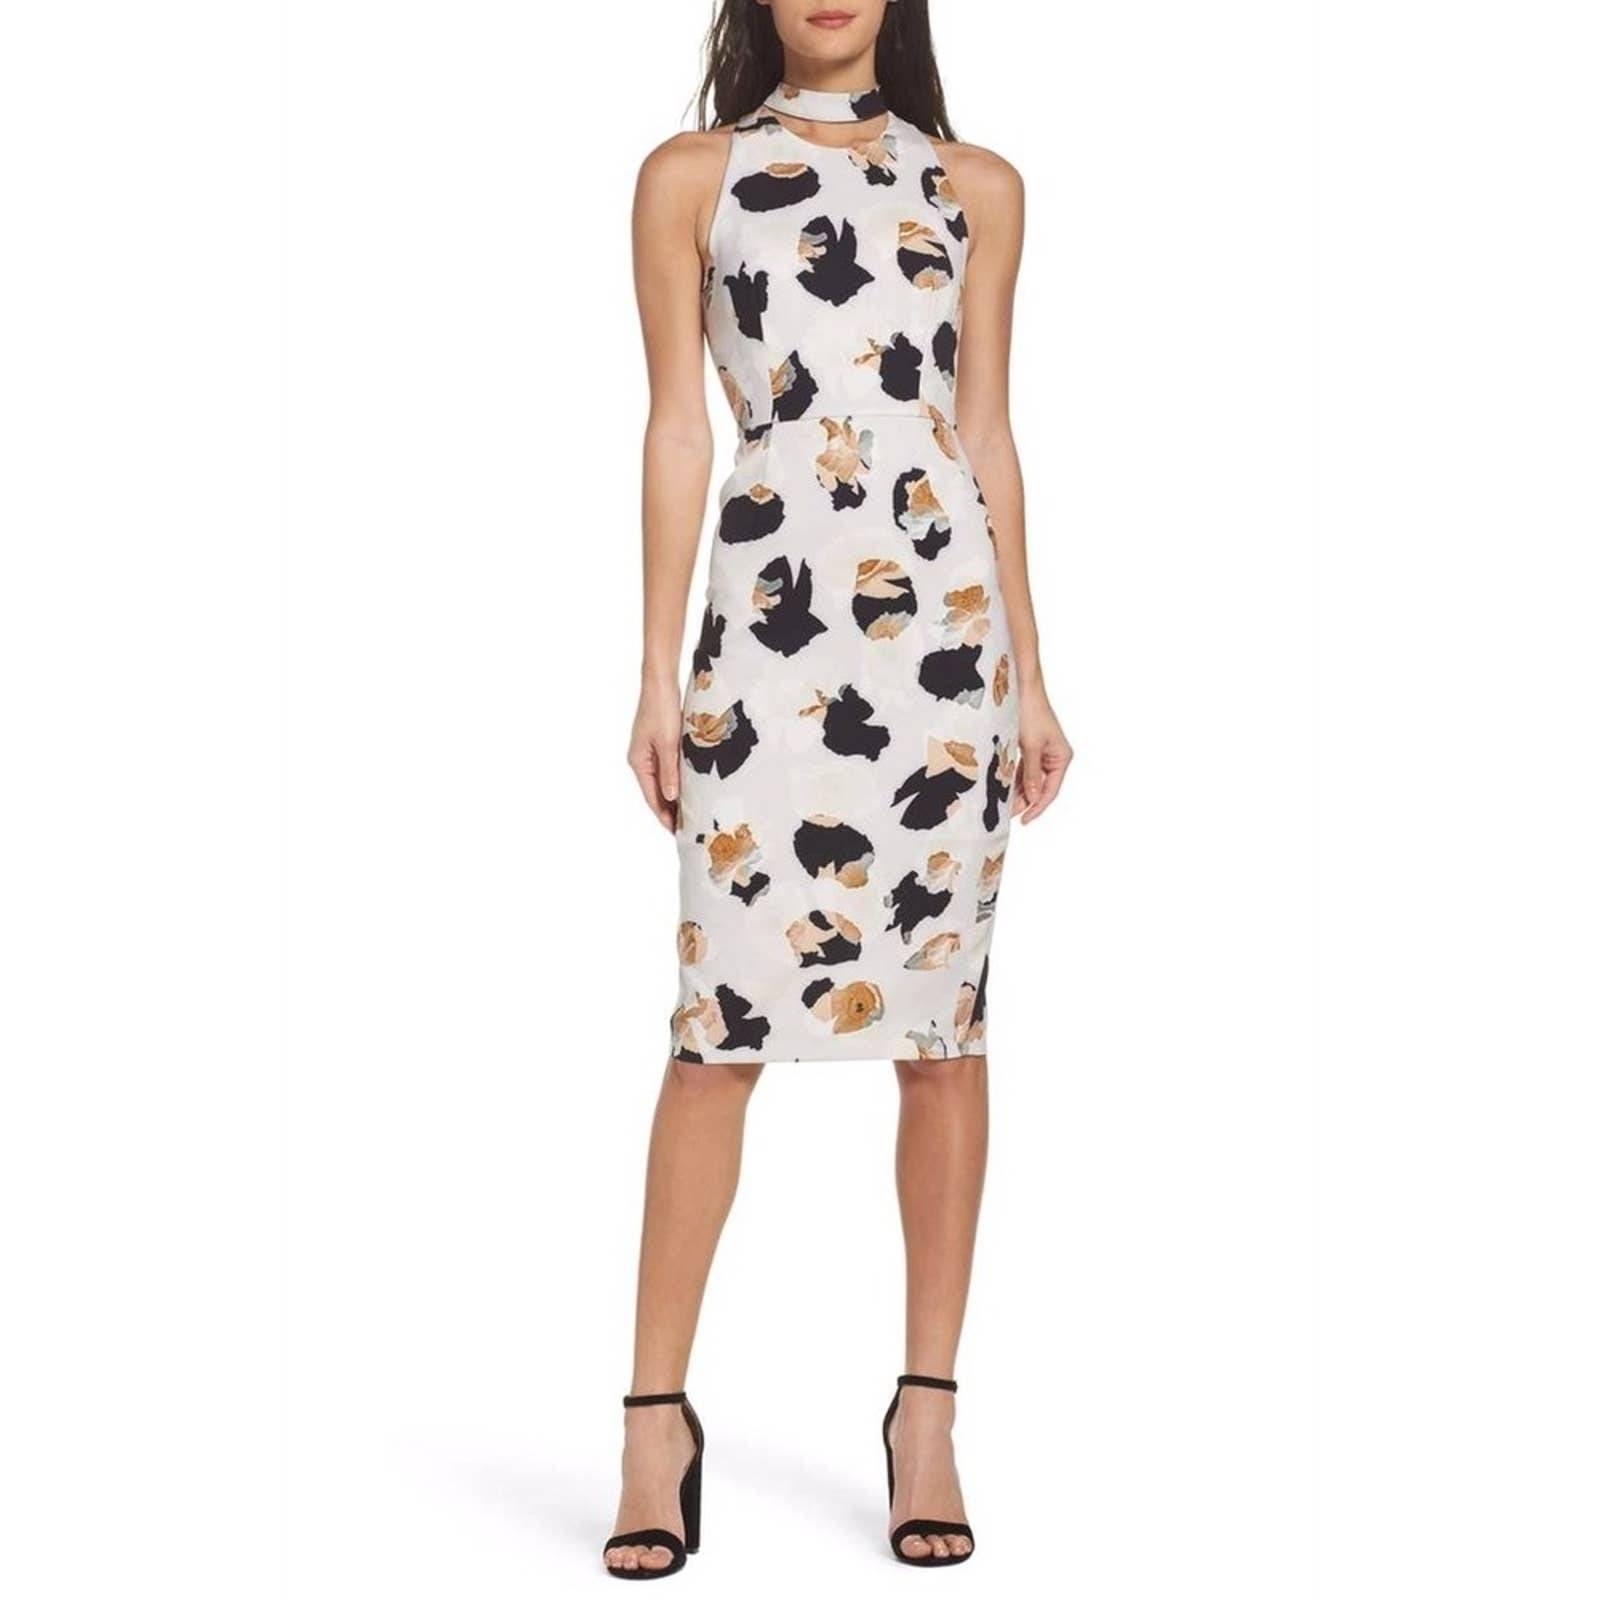 Cooper st lovers liaison floral dress 2